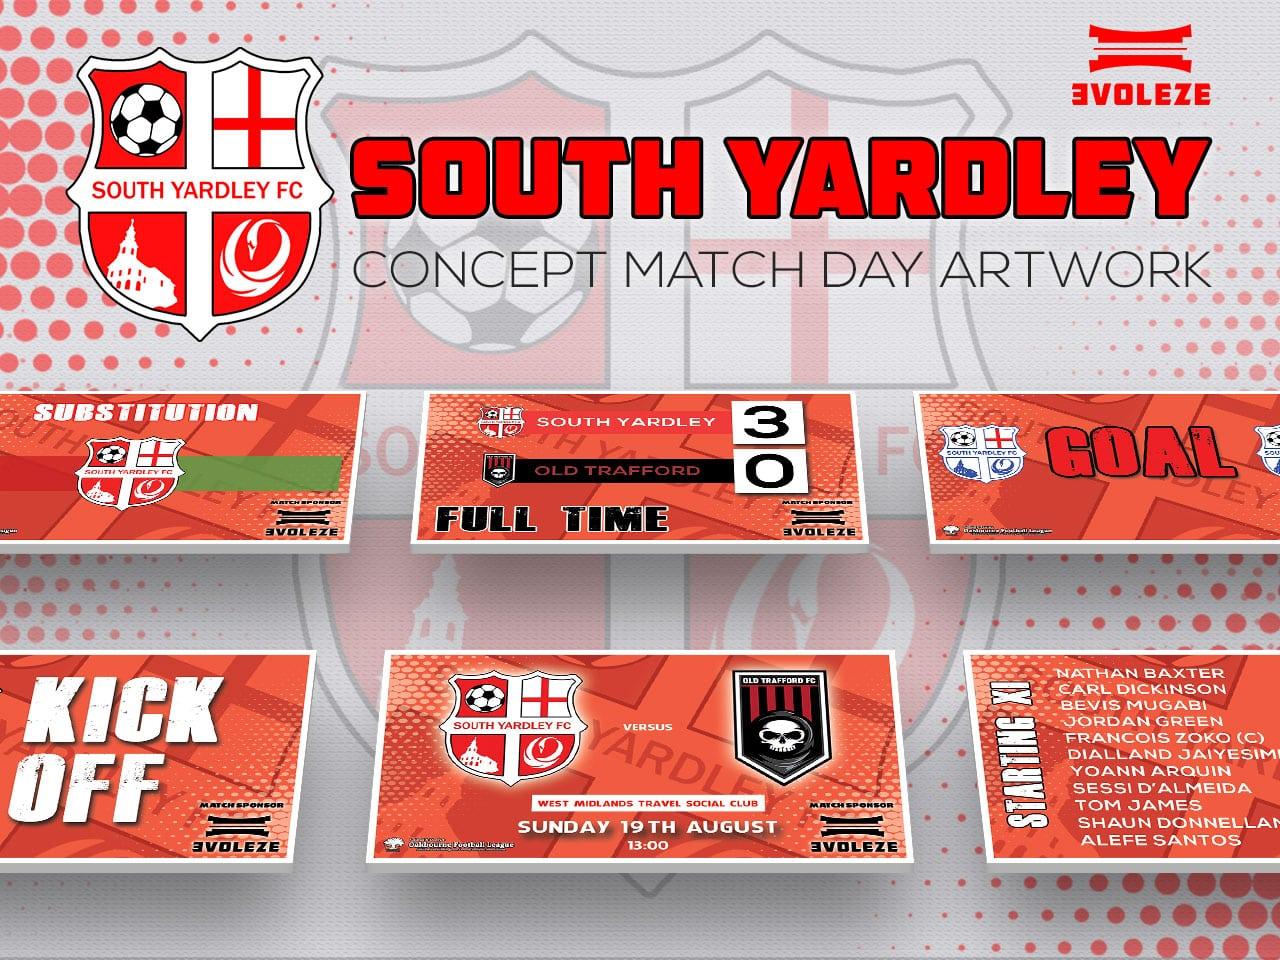 South Yardley FC match day artwork set